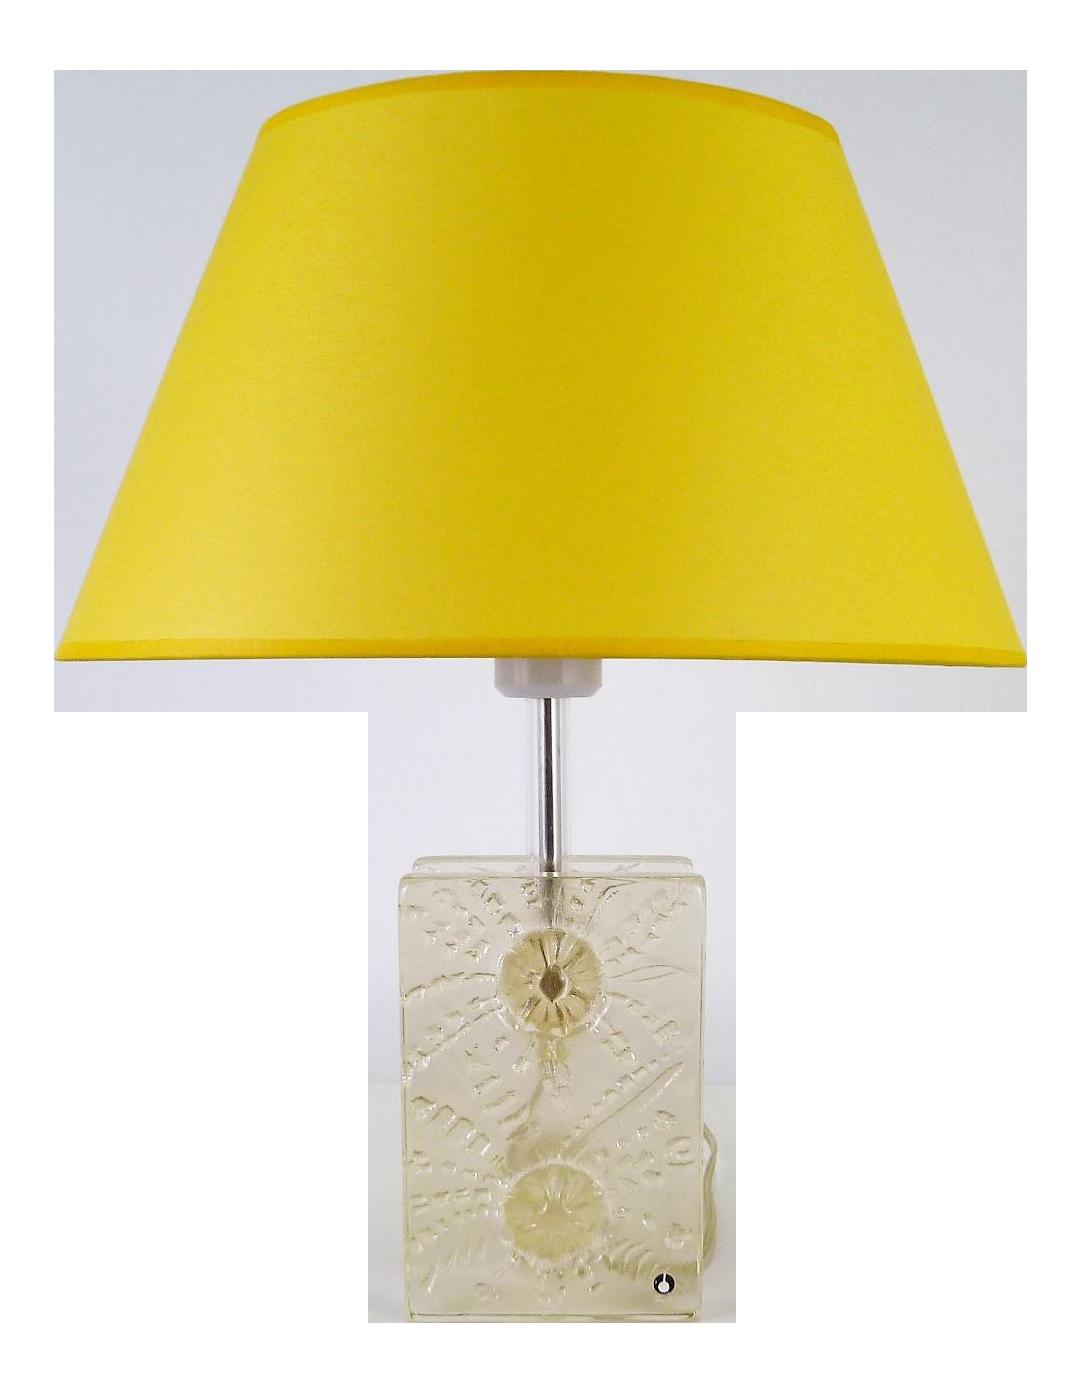 1960s Swedish Modern Pukeberg Ice Glass Table Lamp